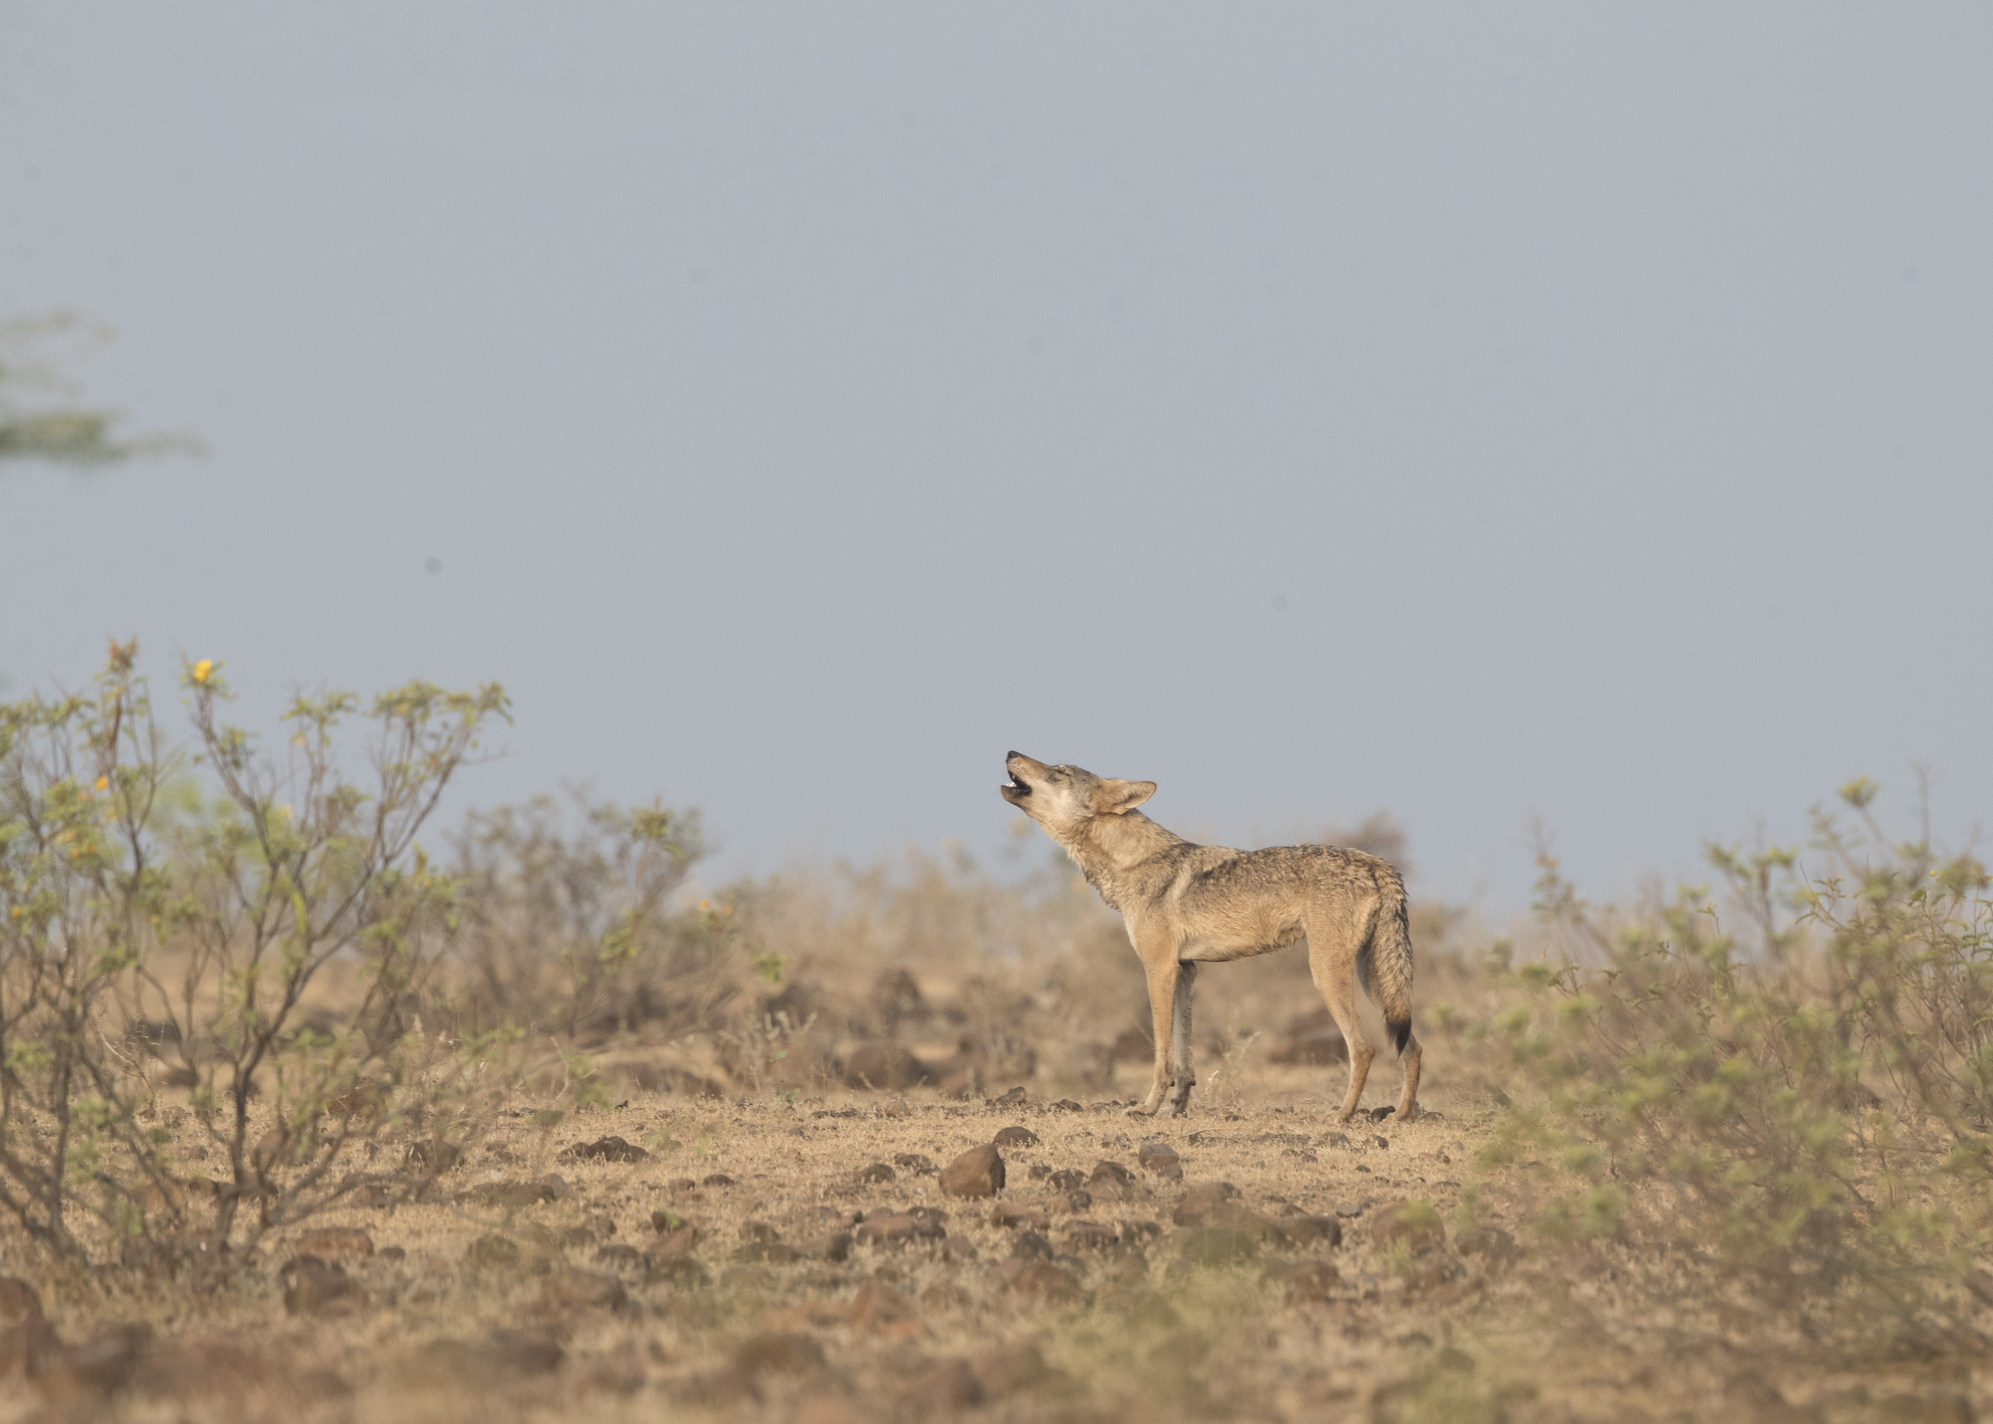 An Indian wolf howls in a grassland